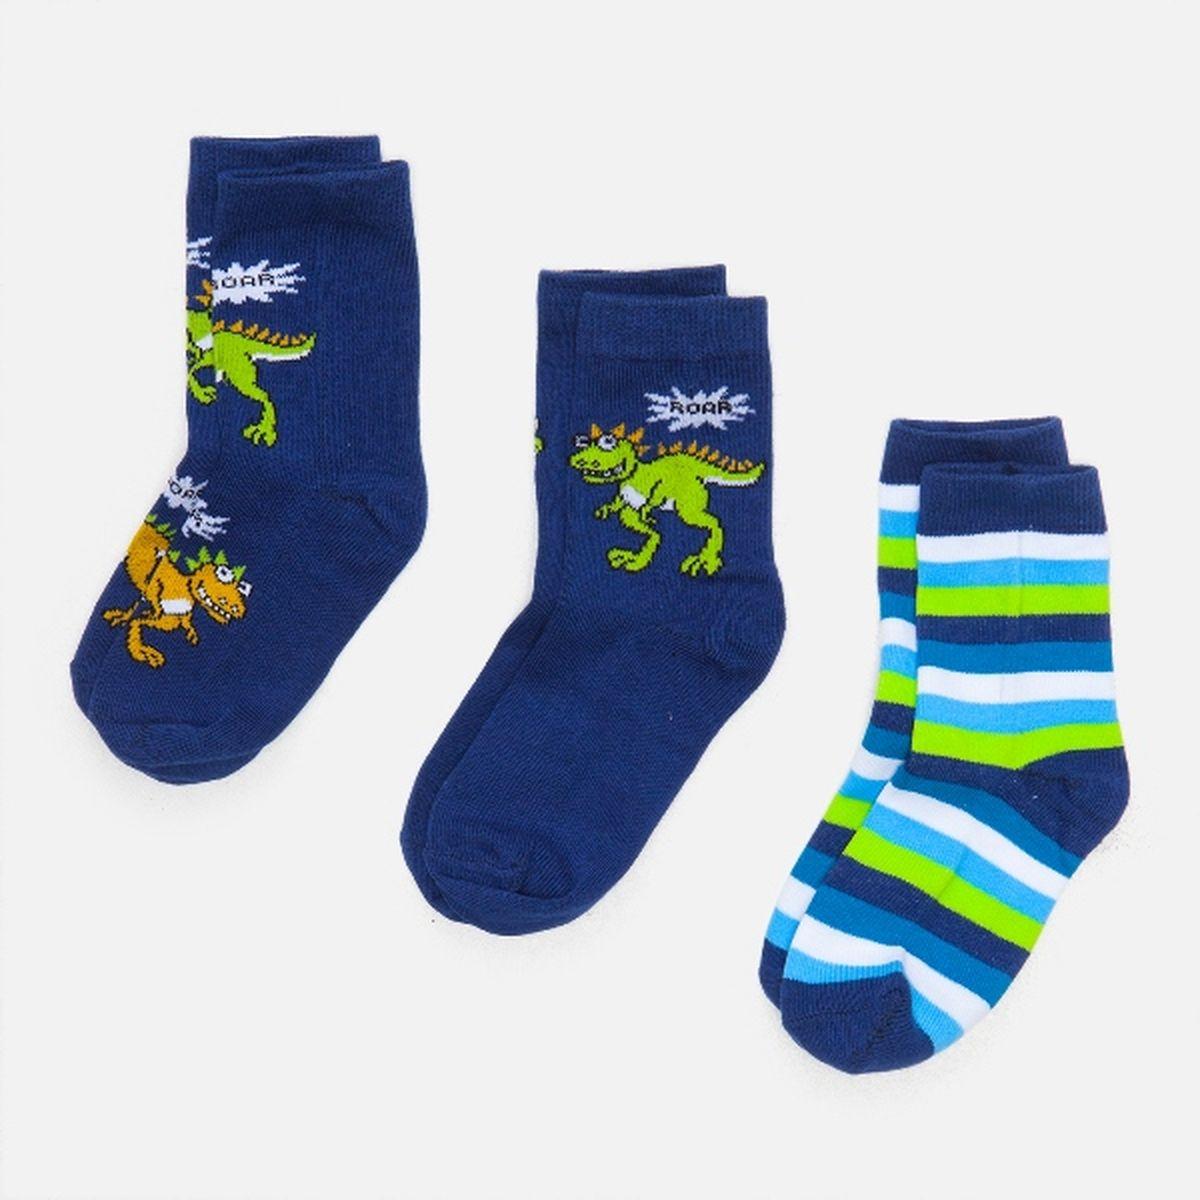 Носки для мальчиков Tinner, 3 шт. 3212442001132124420011_4400